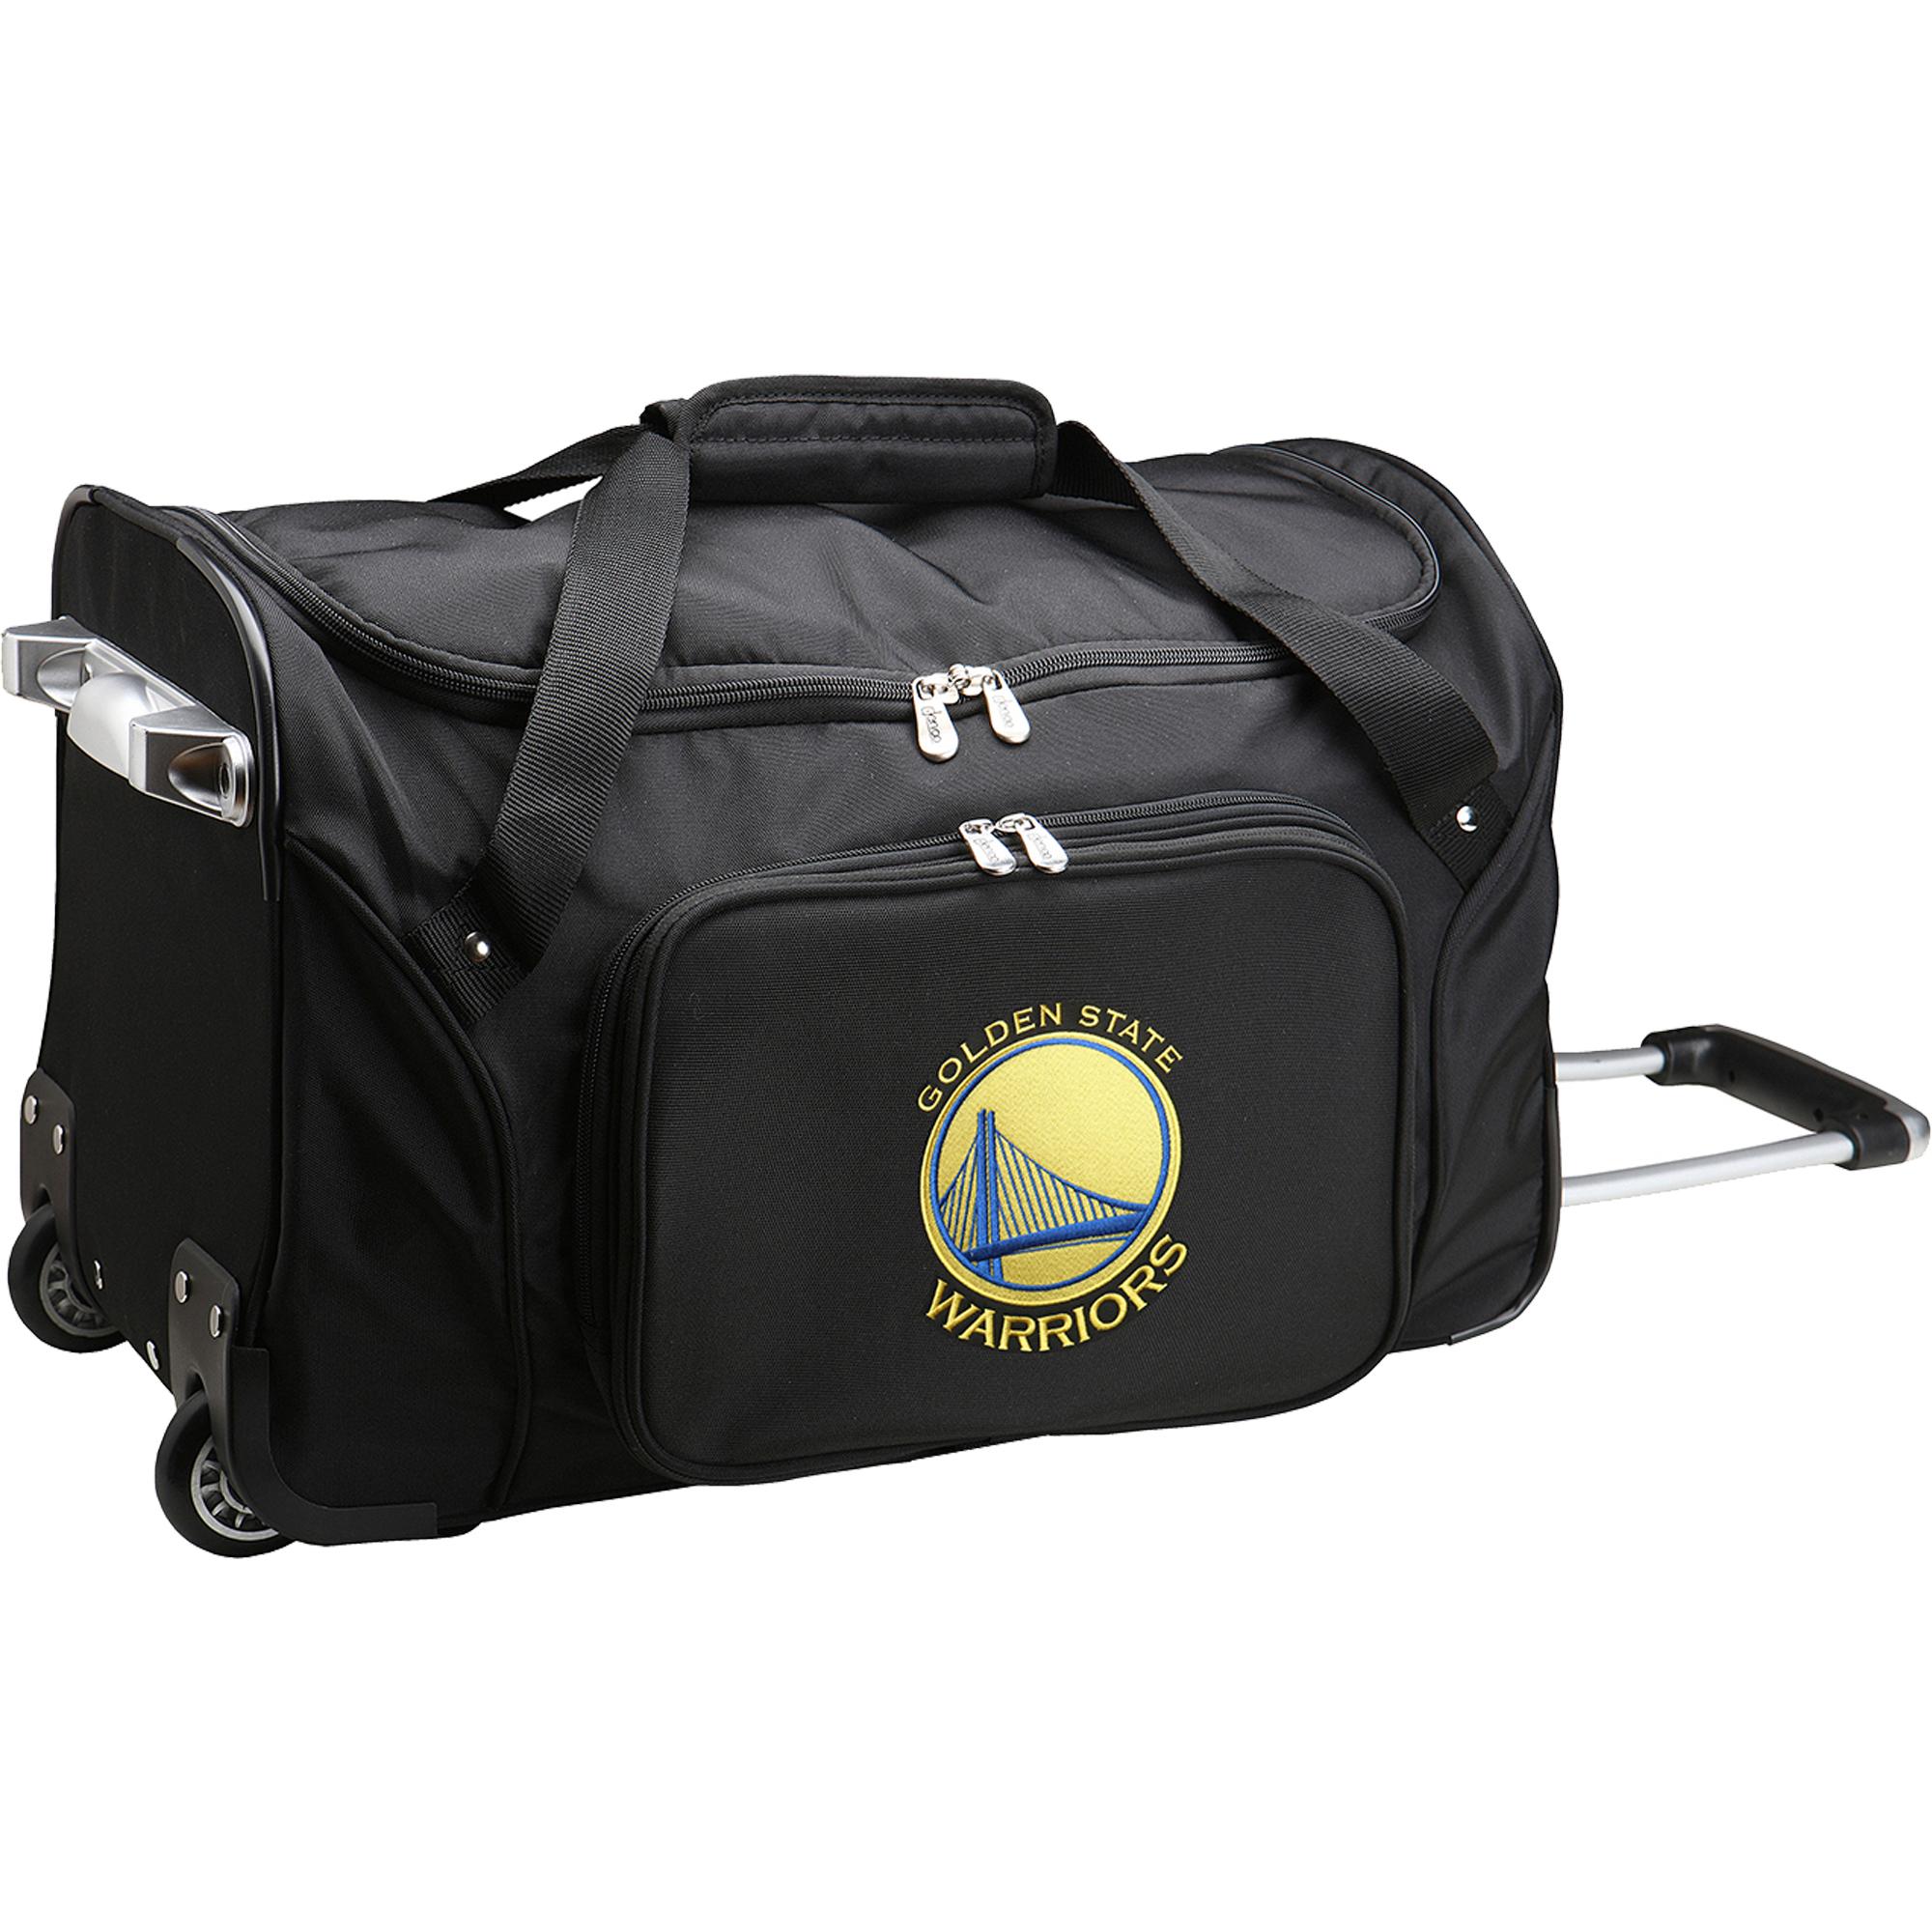 "Golden State Warriors 22"" 2-Wheeled Duffel Bag - Black - No Size"